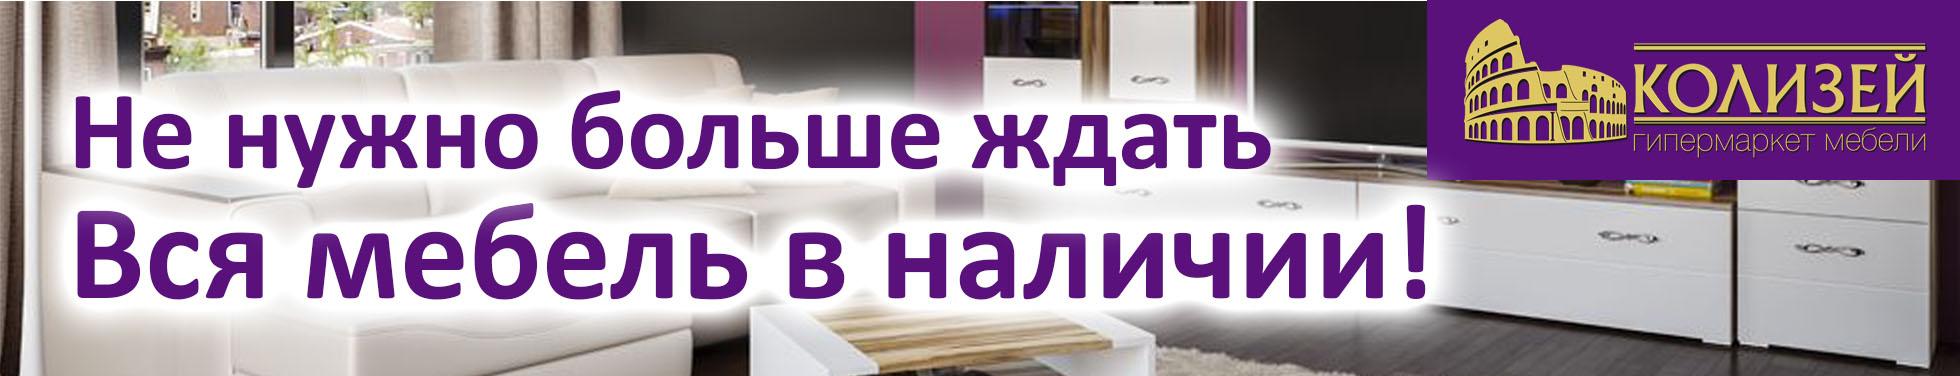 Мебель в Калининграде - Гипермаркет мебели Колизей